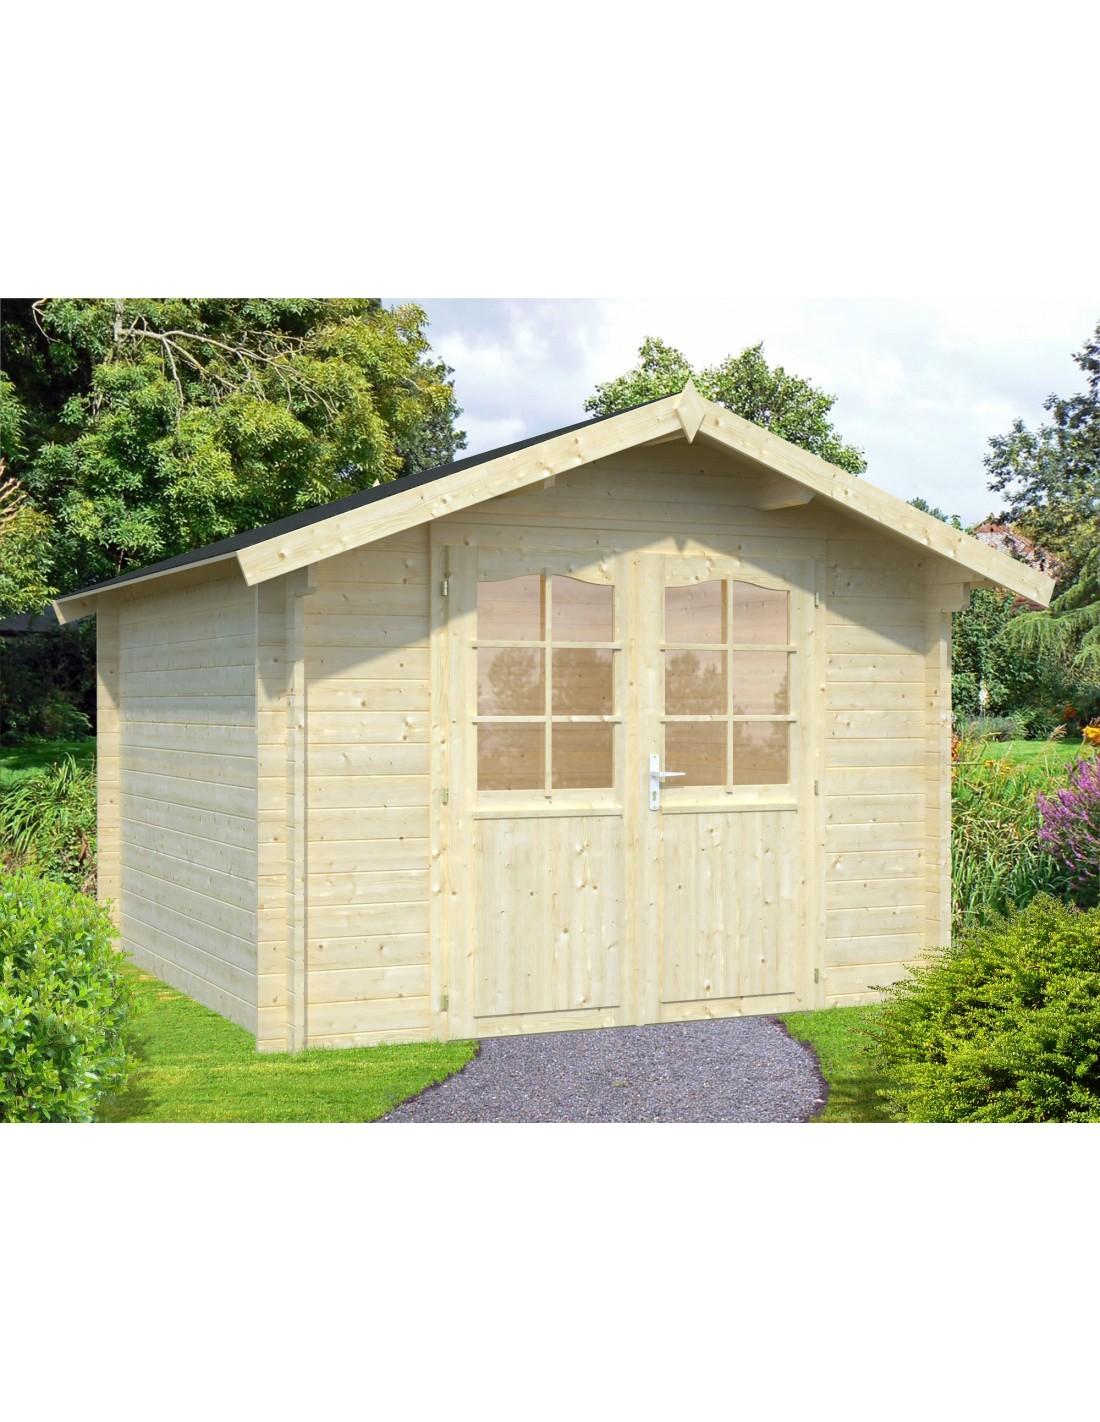 Abri de jardin dublin 7 6 m bois massif 34 mm for Abri de jardin 34mm